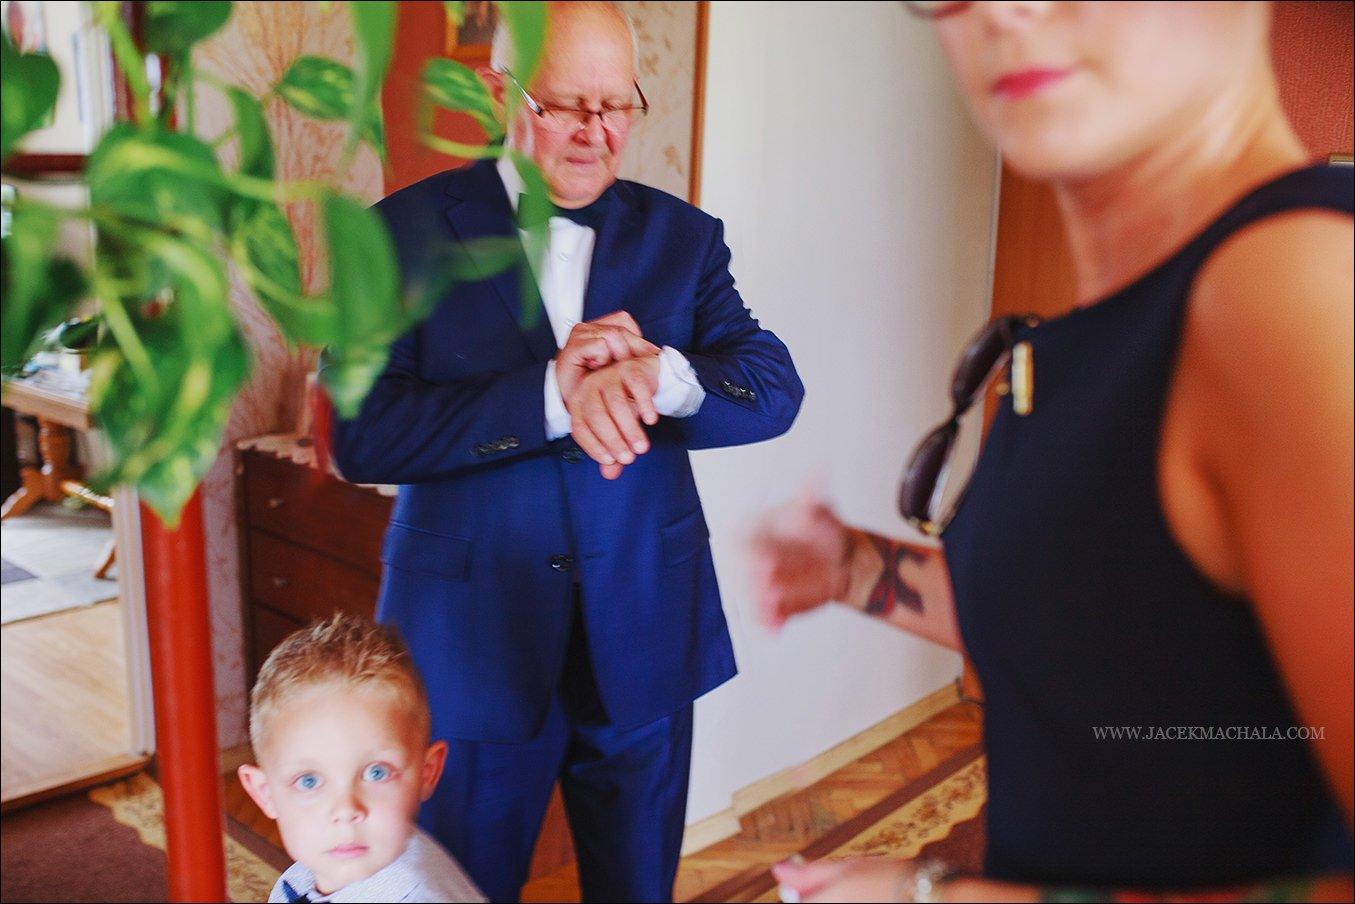 fotograf bielsko biala aga i piotr 18 - Willa Słoneczna - AGA & PIOTR